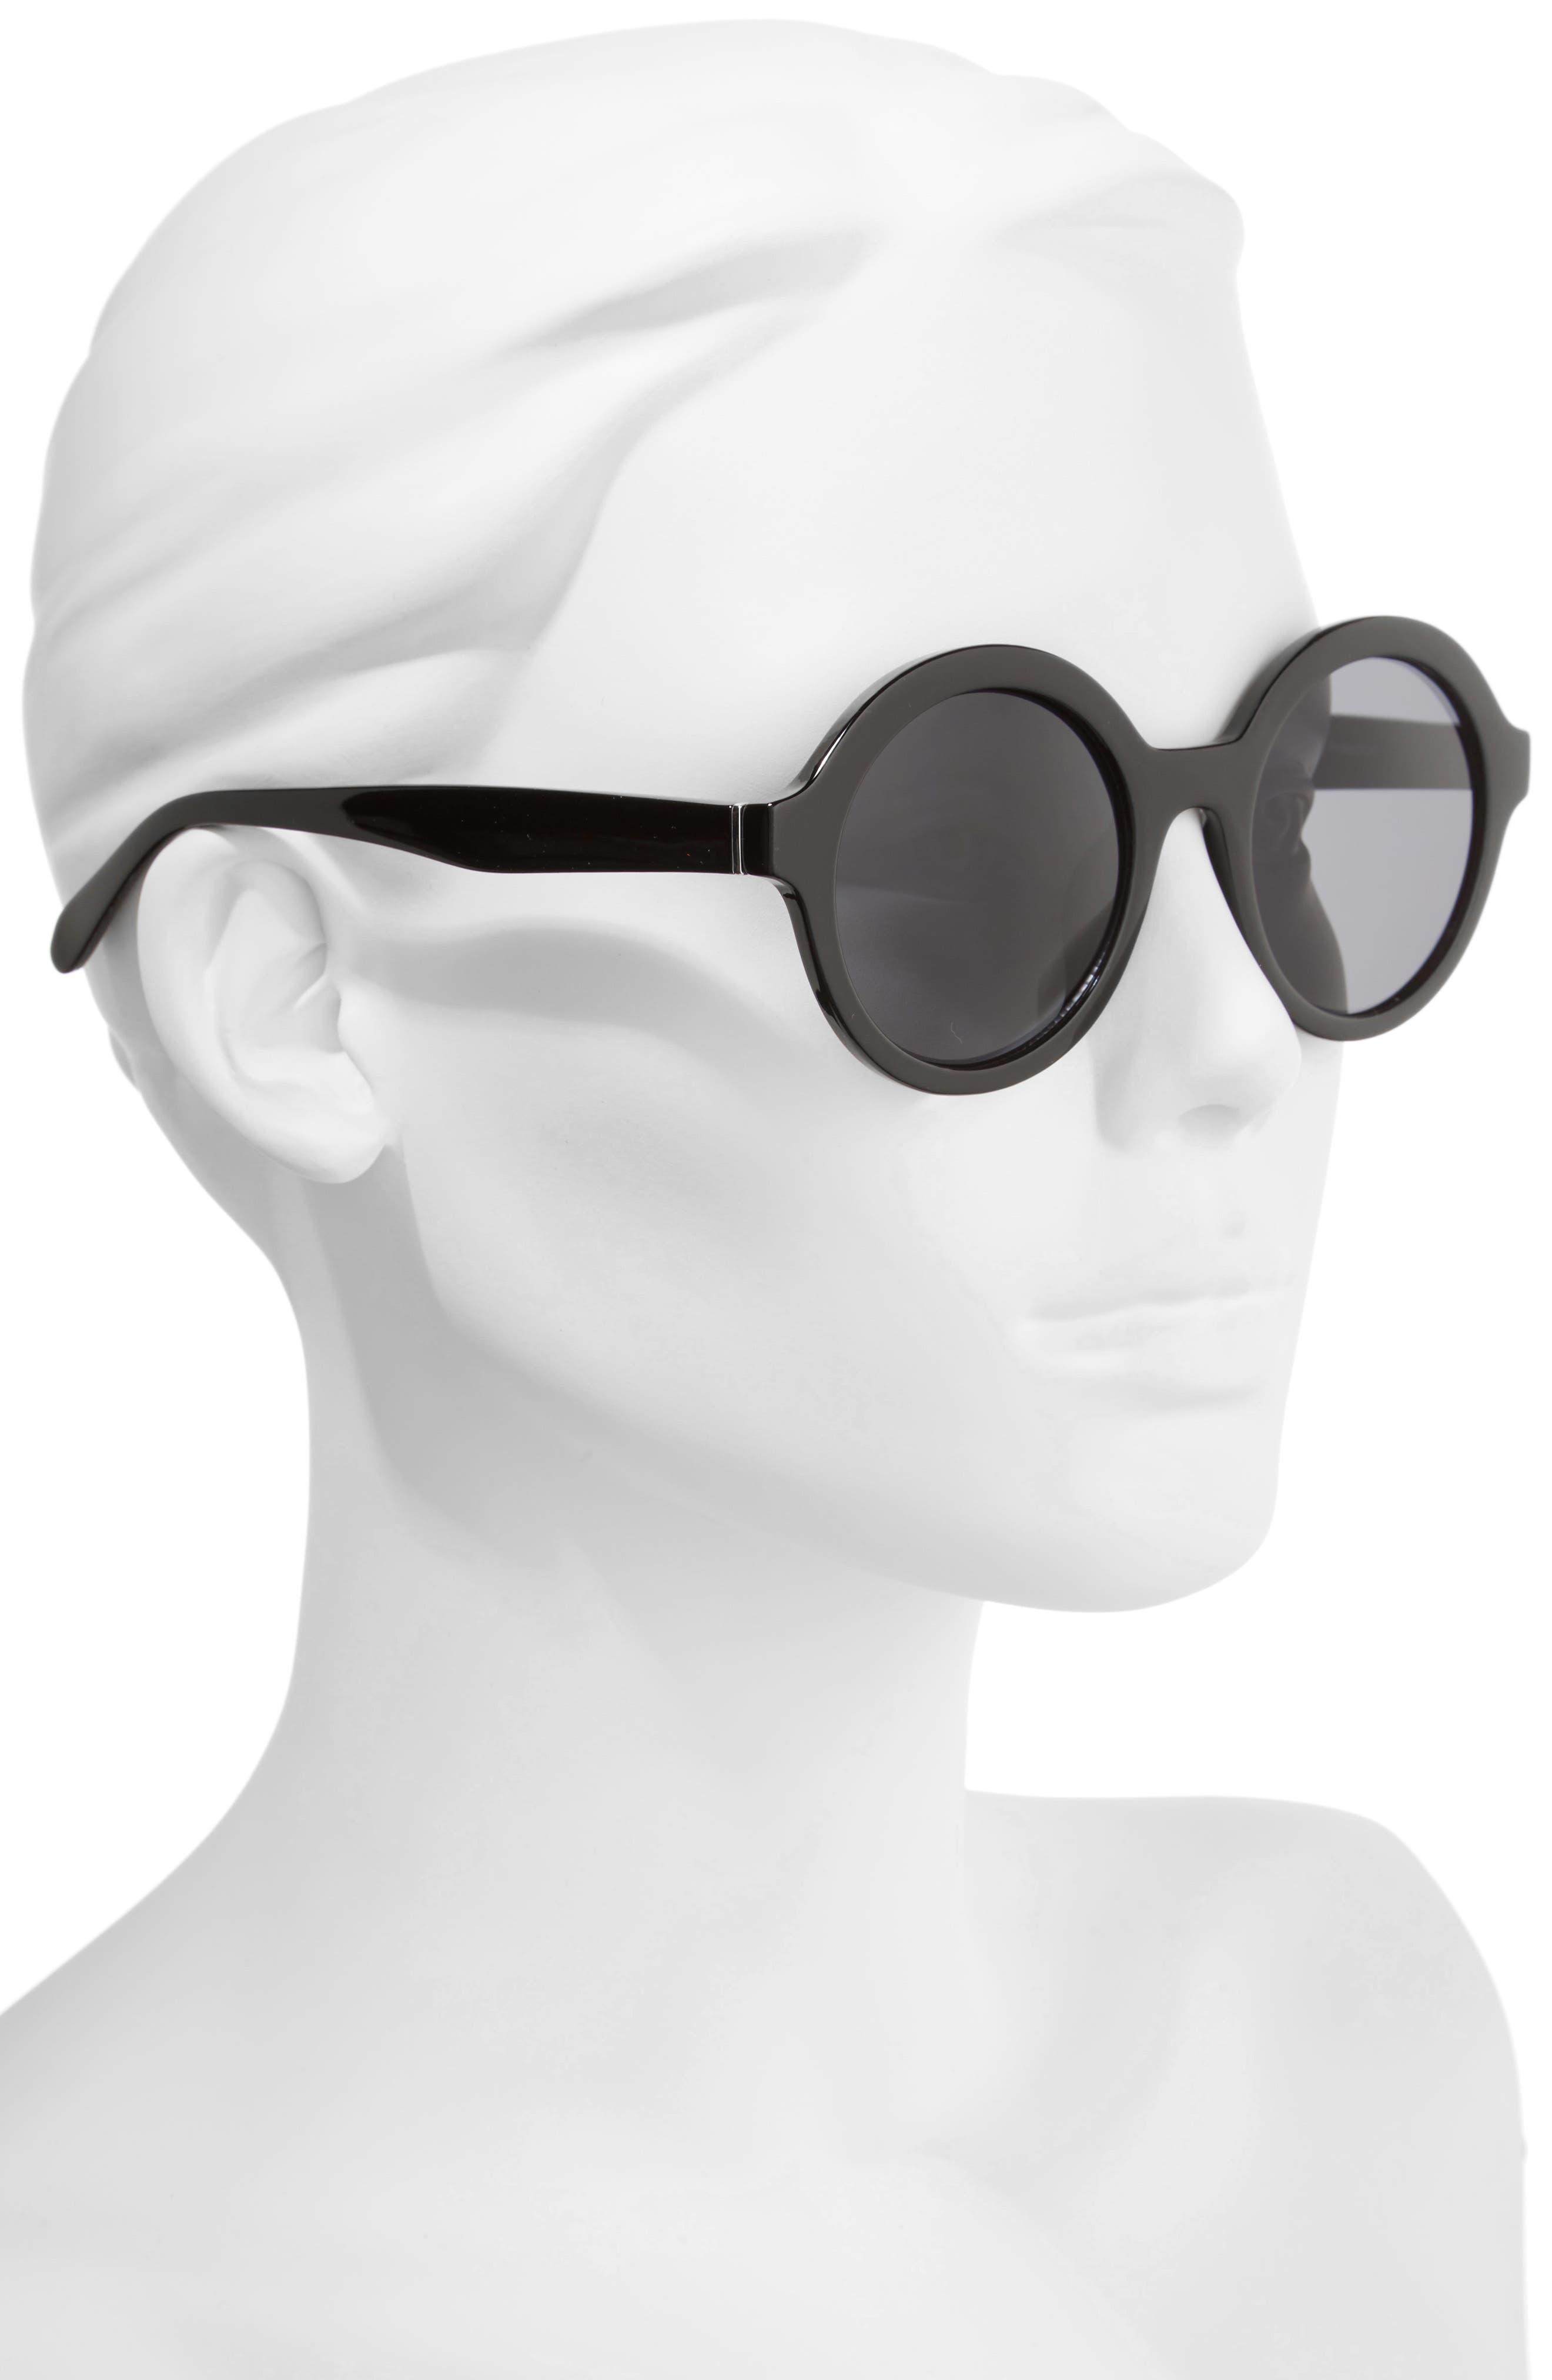 50mm Round Sunglasses,                             Alternate thumbnail 2, color,                             Black